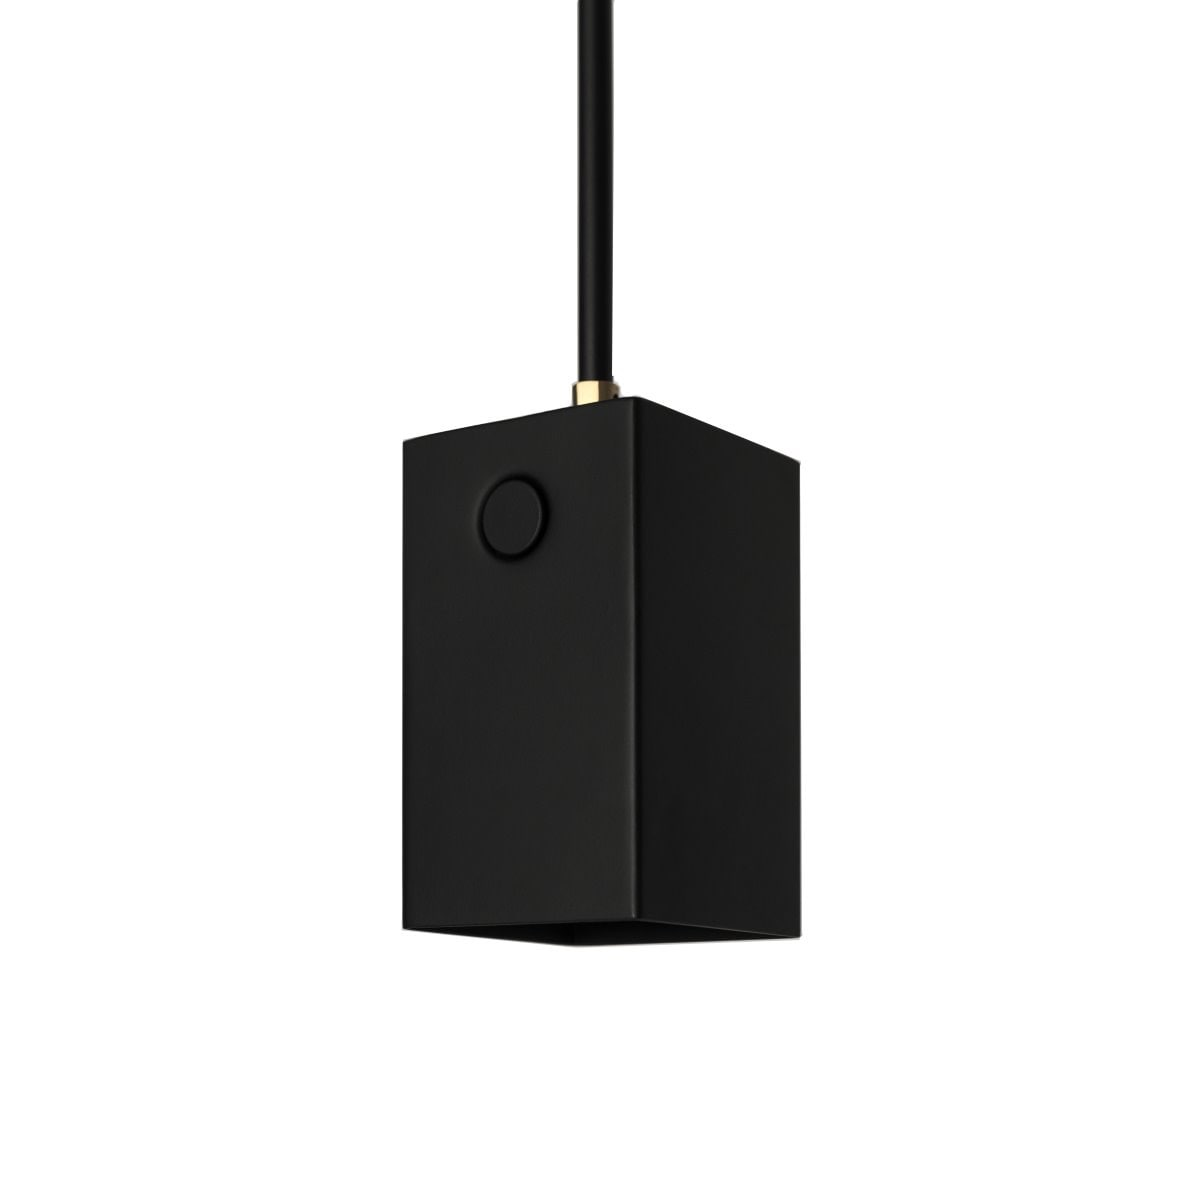 Box taklampa svart